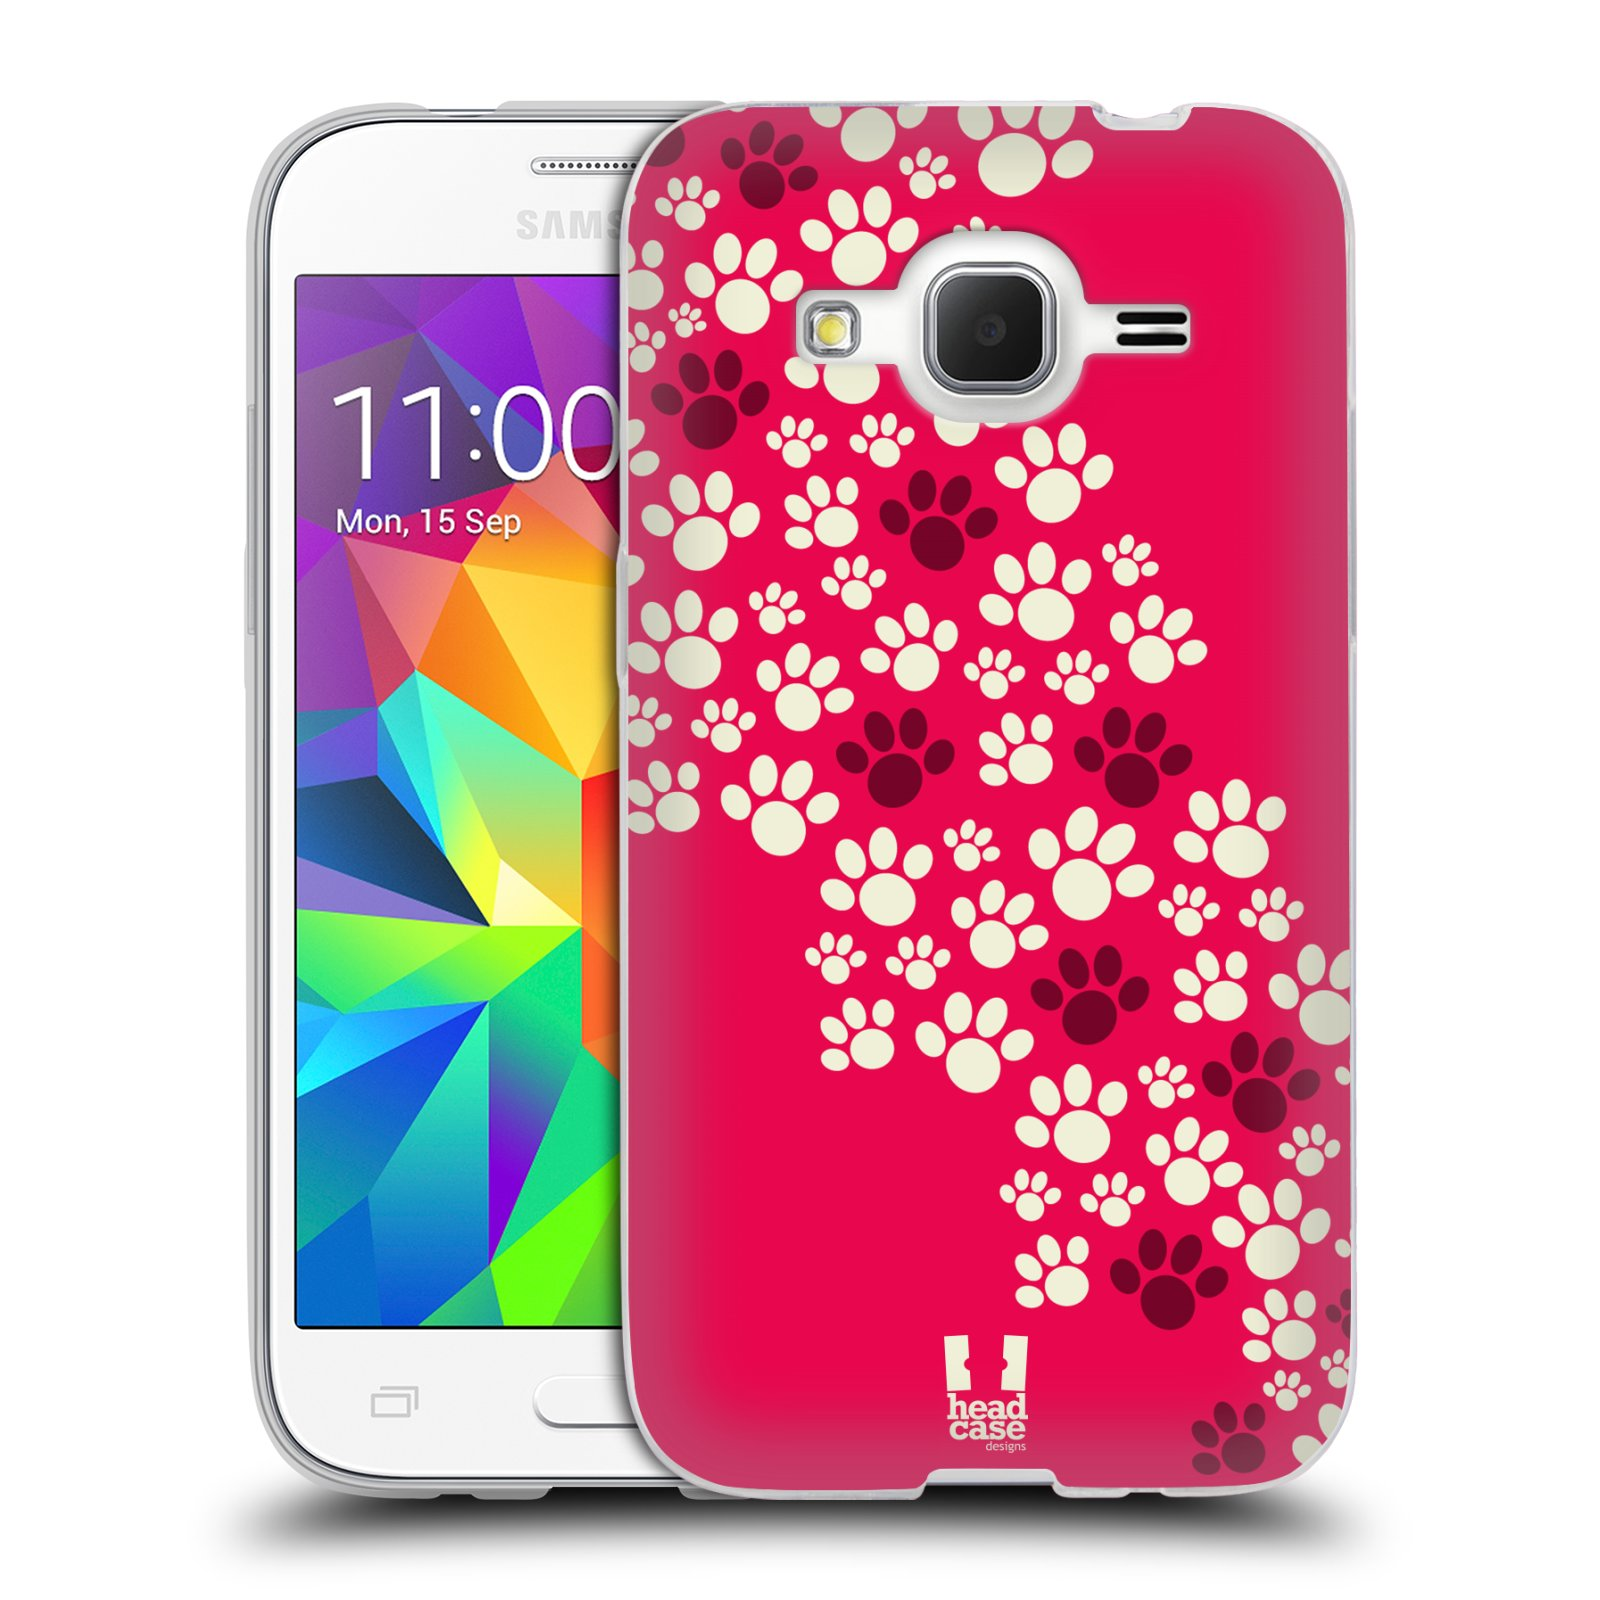 Silikonové pouzdro na mobil Samsung Galaxy Core Prime LTE HEAD CASE TLAPKY RŮŽOVÉ (Silikonový kryt či obal na mobilní telefon Samsung Galaxy Core Prime LTE SM-G360)